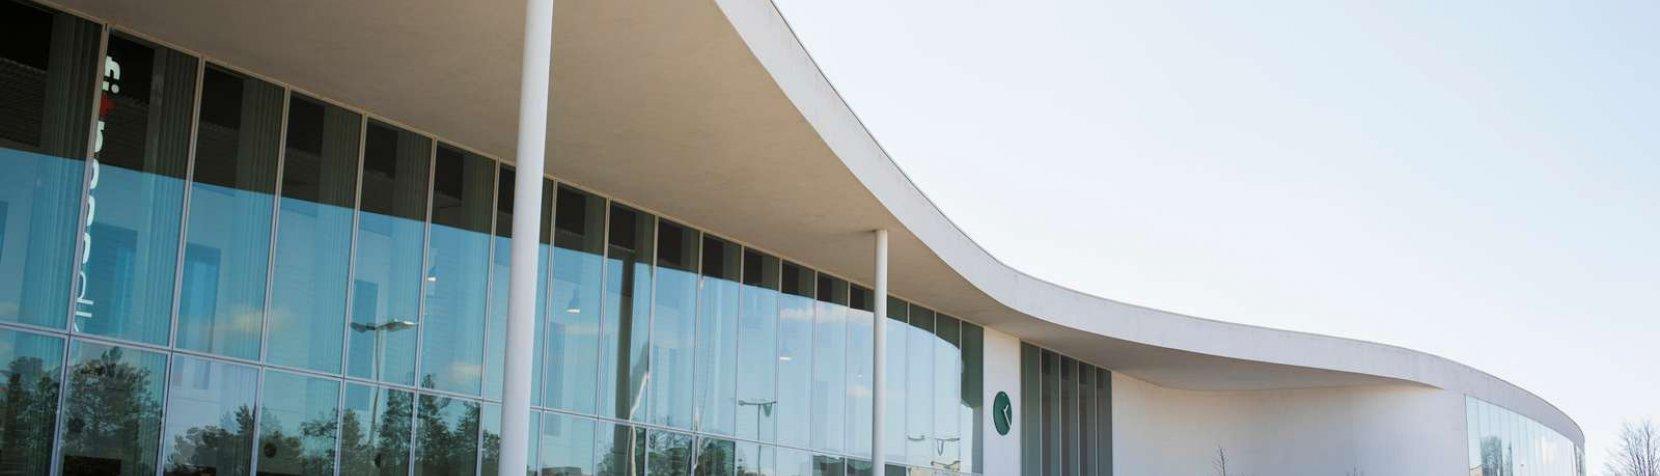 Birkerød Idrætscenter facade